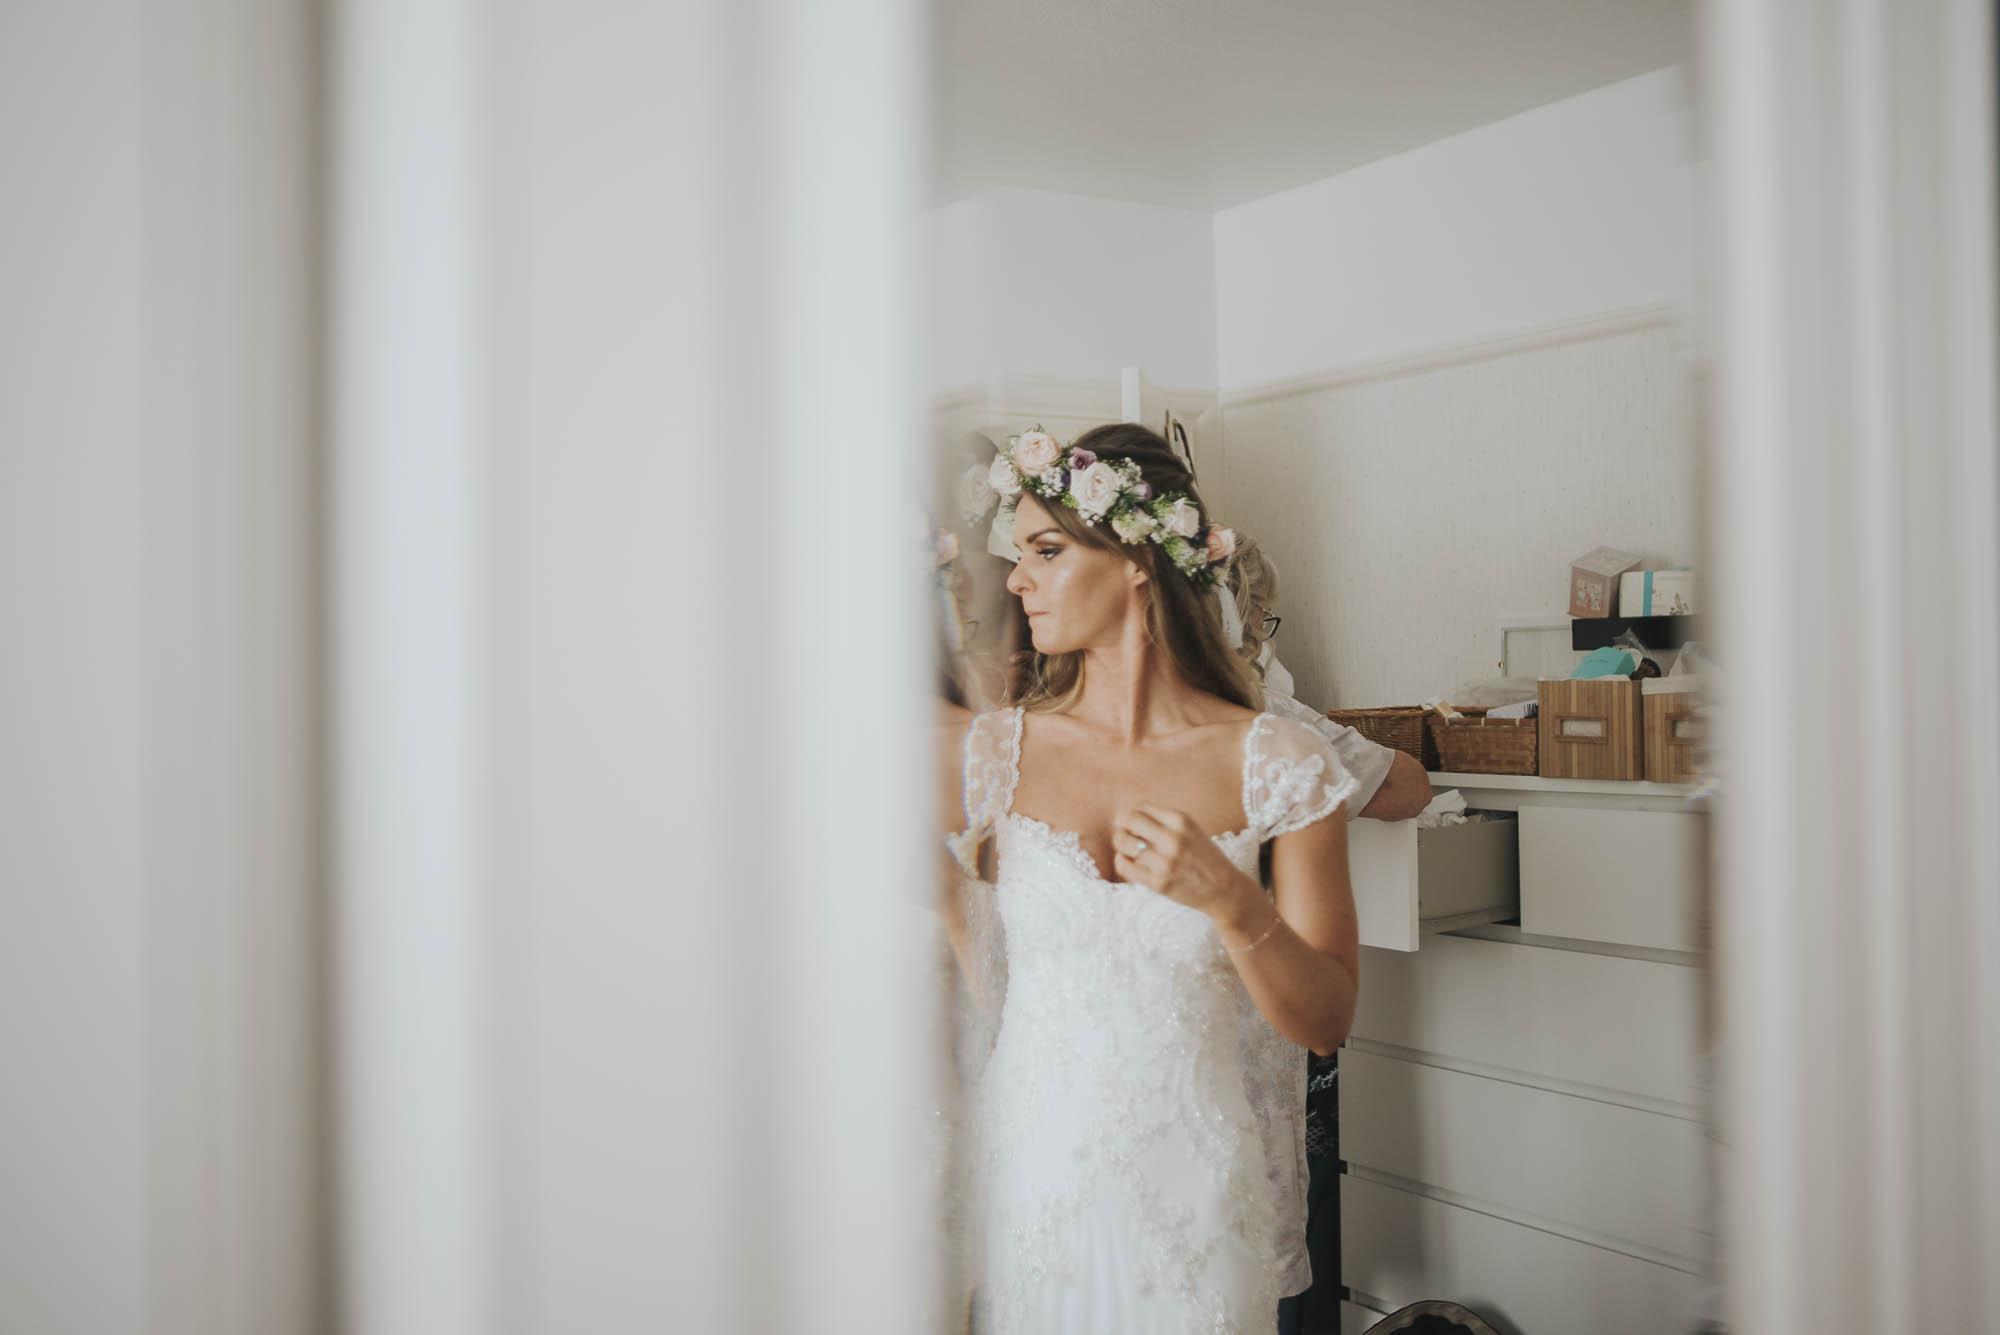 Boho Bride gets ready for her wedding